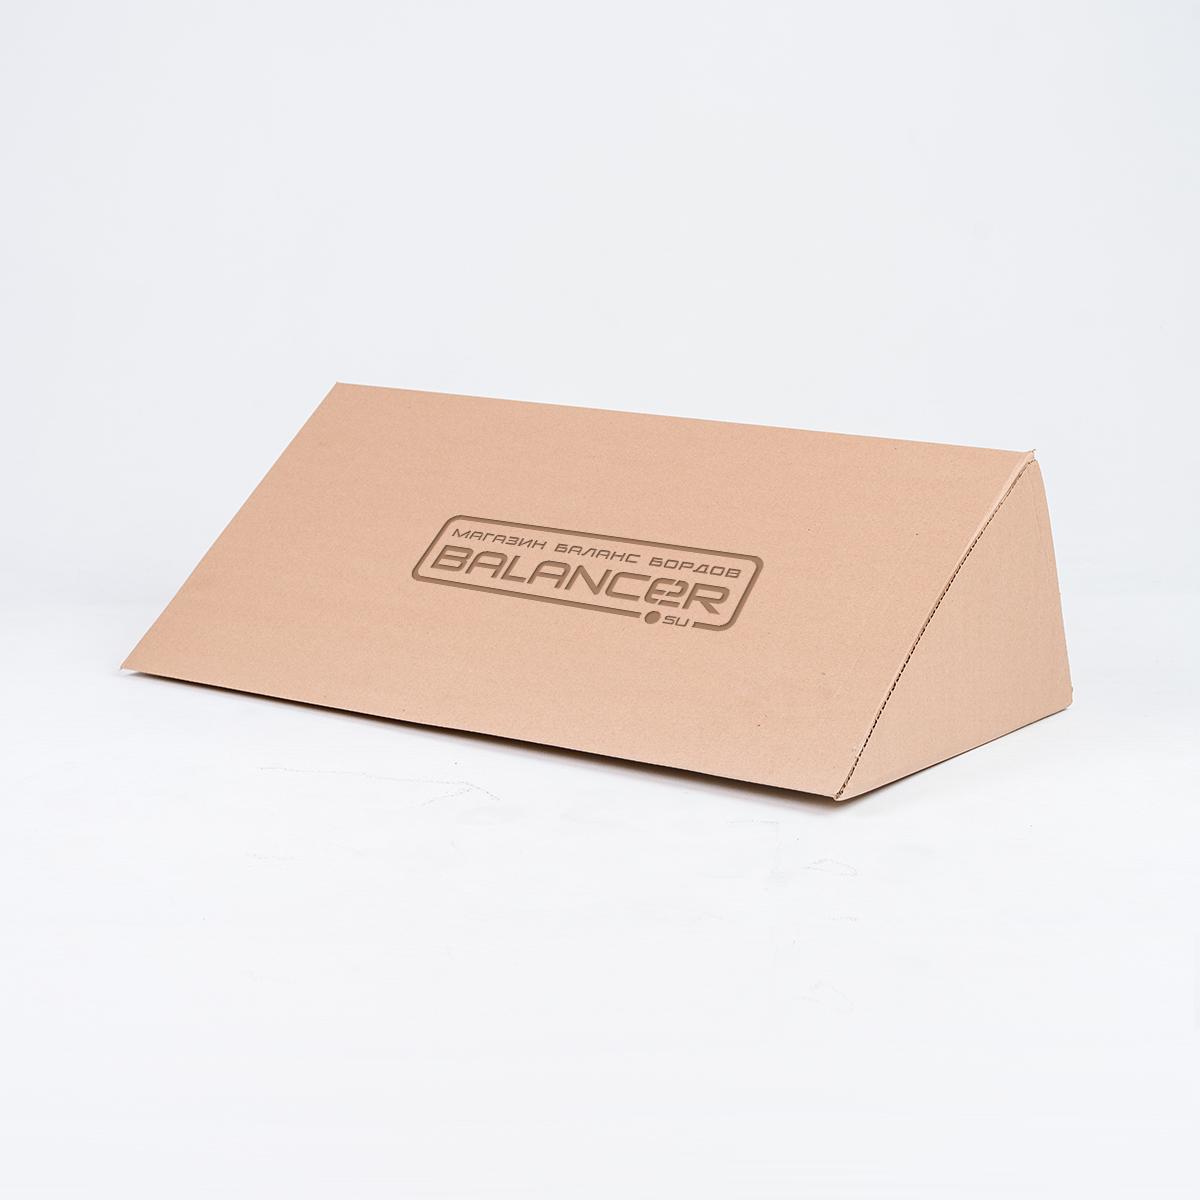 коробка для балансборда